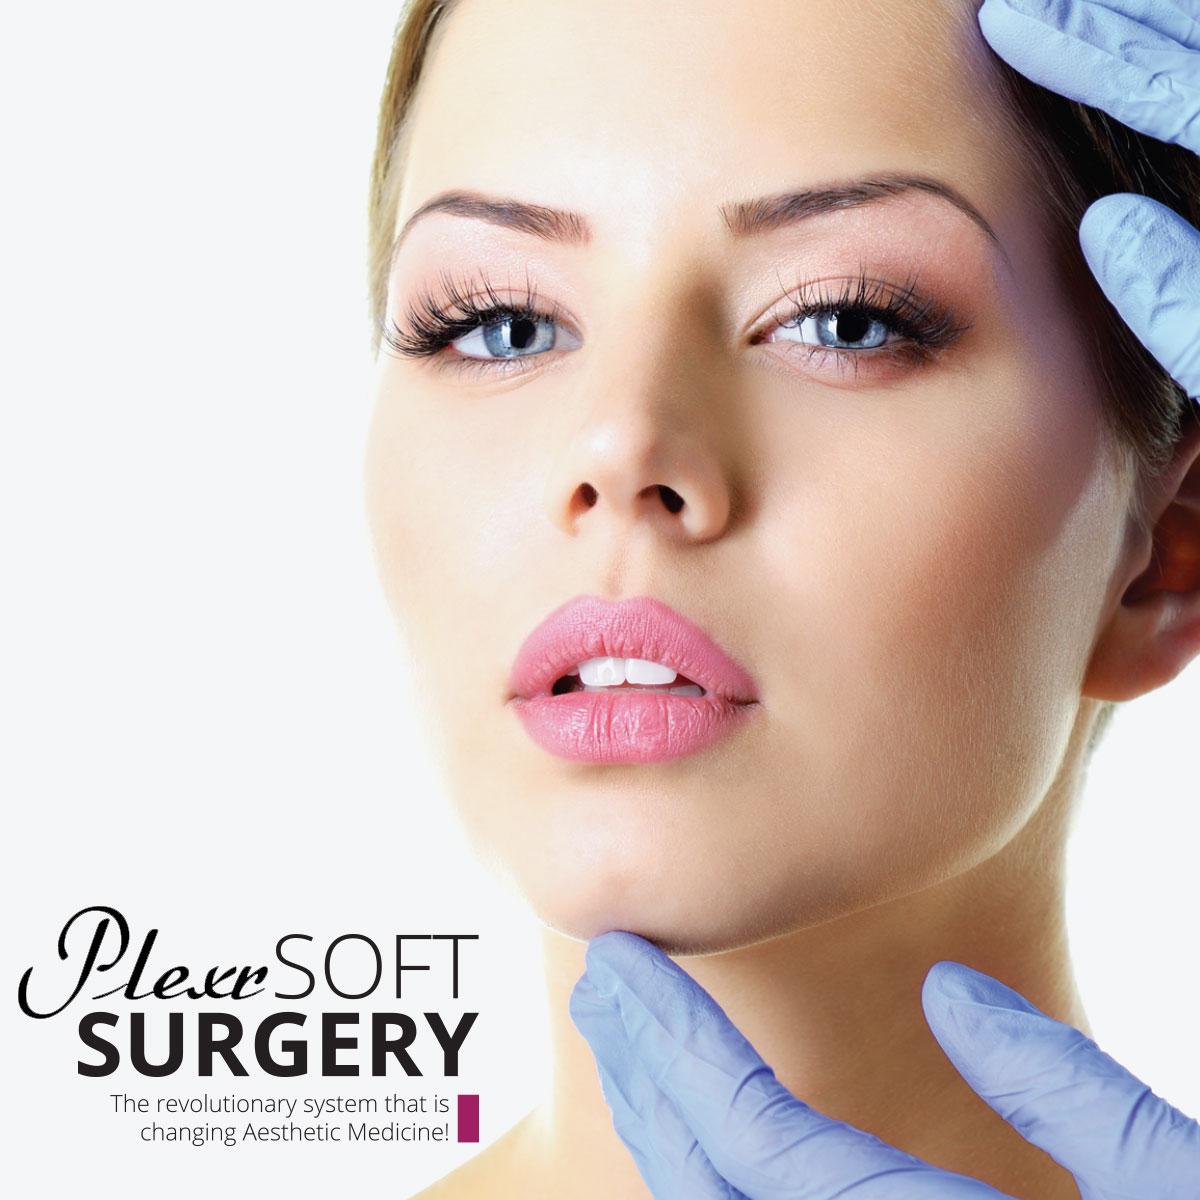 PLEXR soft surgery